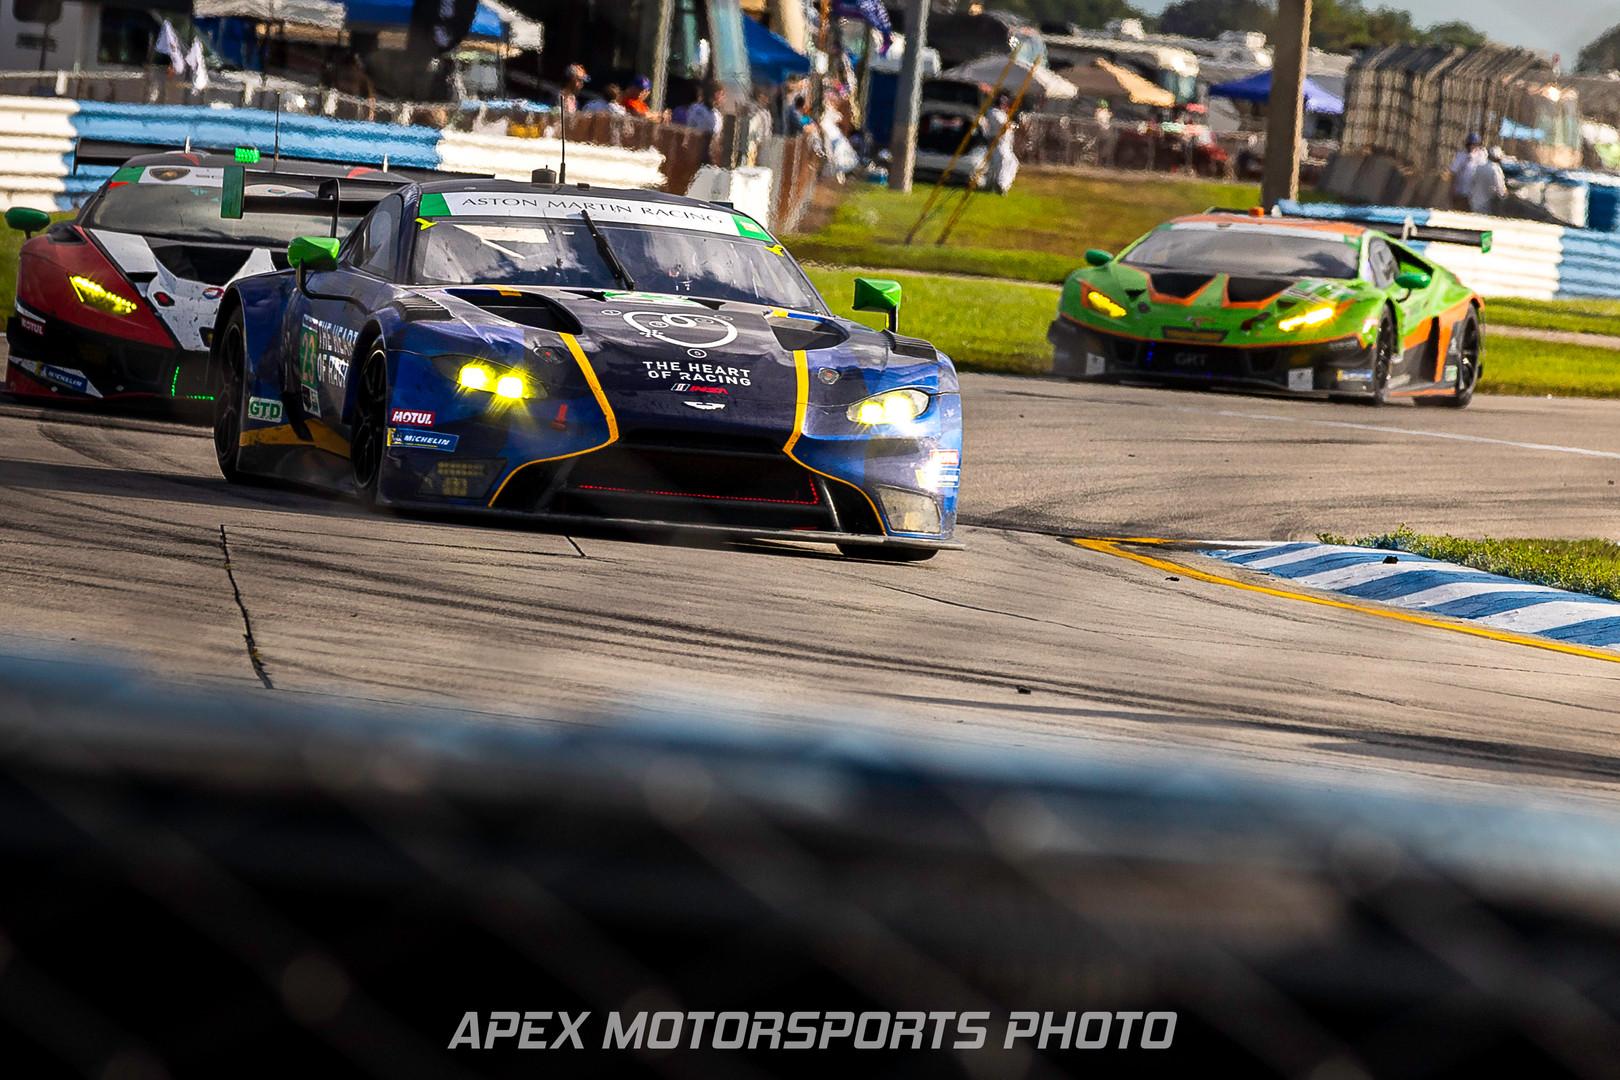 Heart Of Racing Team Aston Martin Vantag